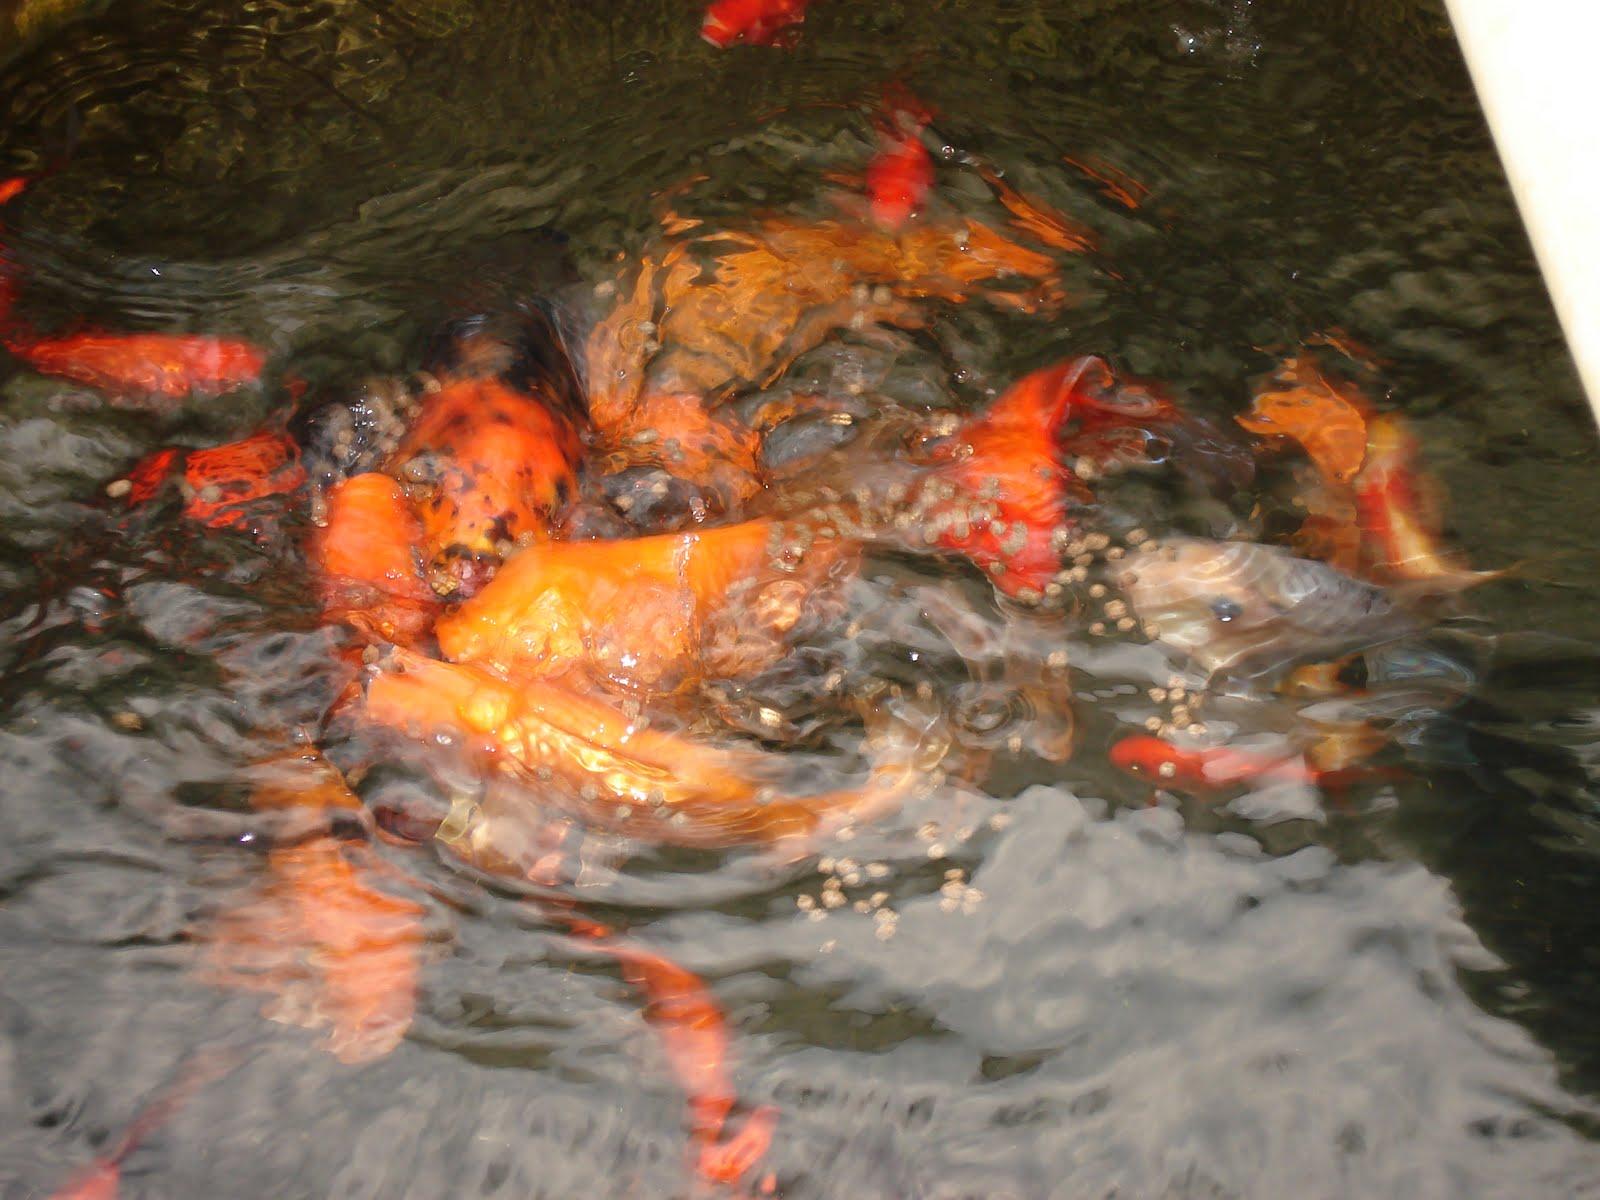 Peces ornamentales koi kois cultivados for Cria de peces ornamentales